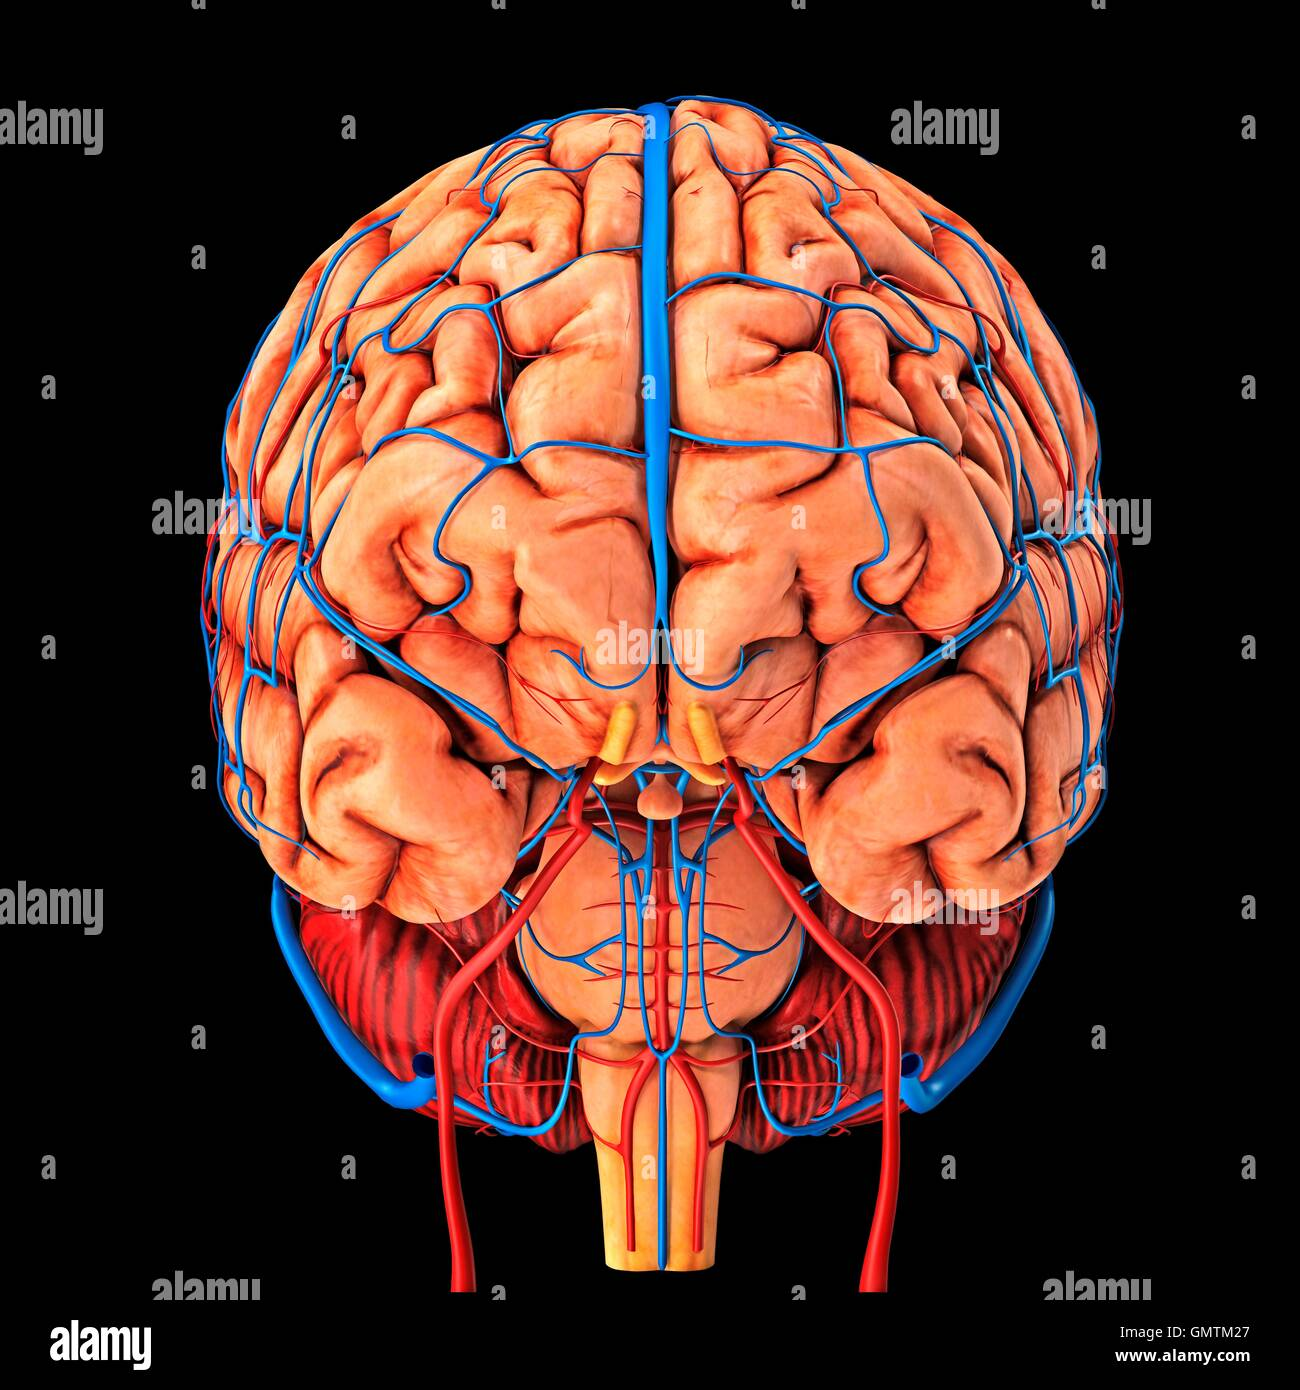 Brain Veins And Anatomy Imágenes De Stock & Brain Veins And Anatomy ...